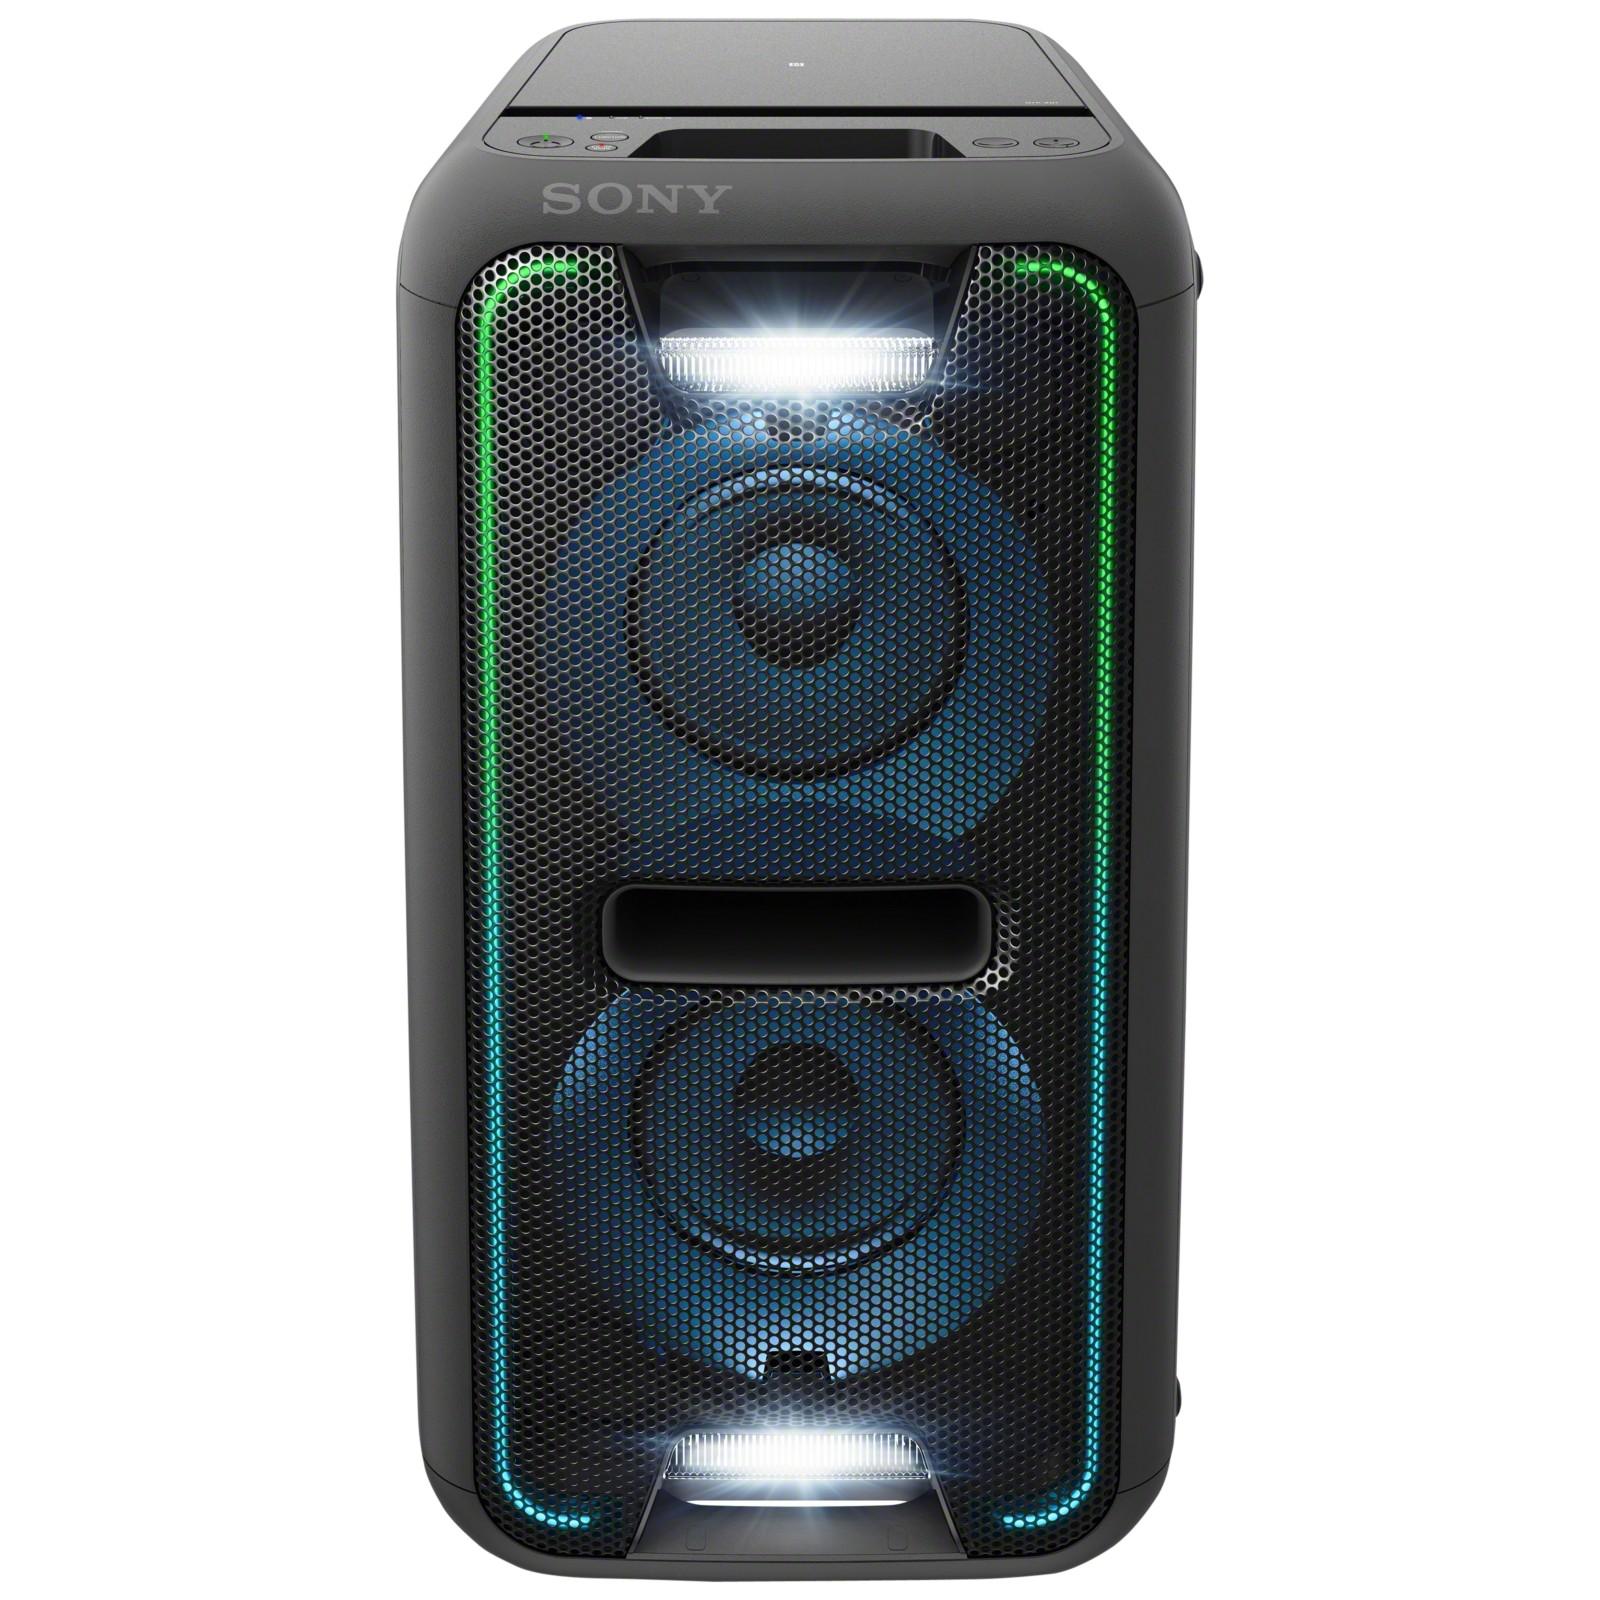 Sony GTKXB7B Boombox Wireless Bluetooth NFC Speaker With LED Lighting Black